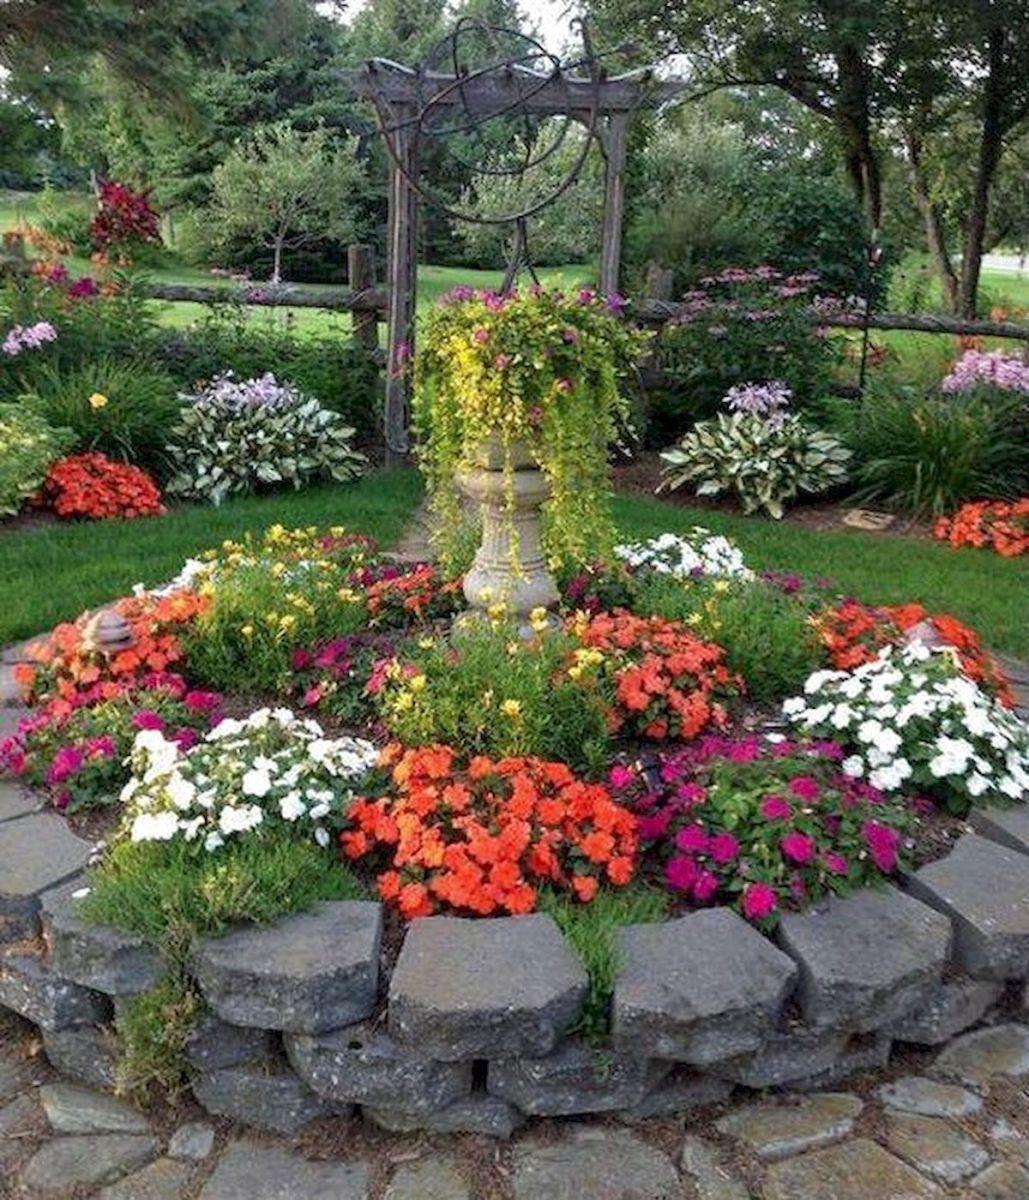 50 beautiful flower garden design ideas with images